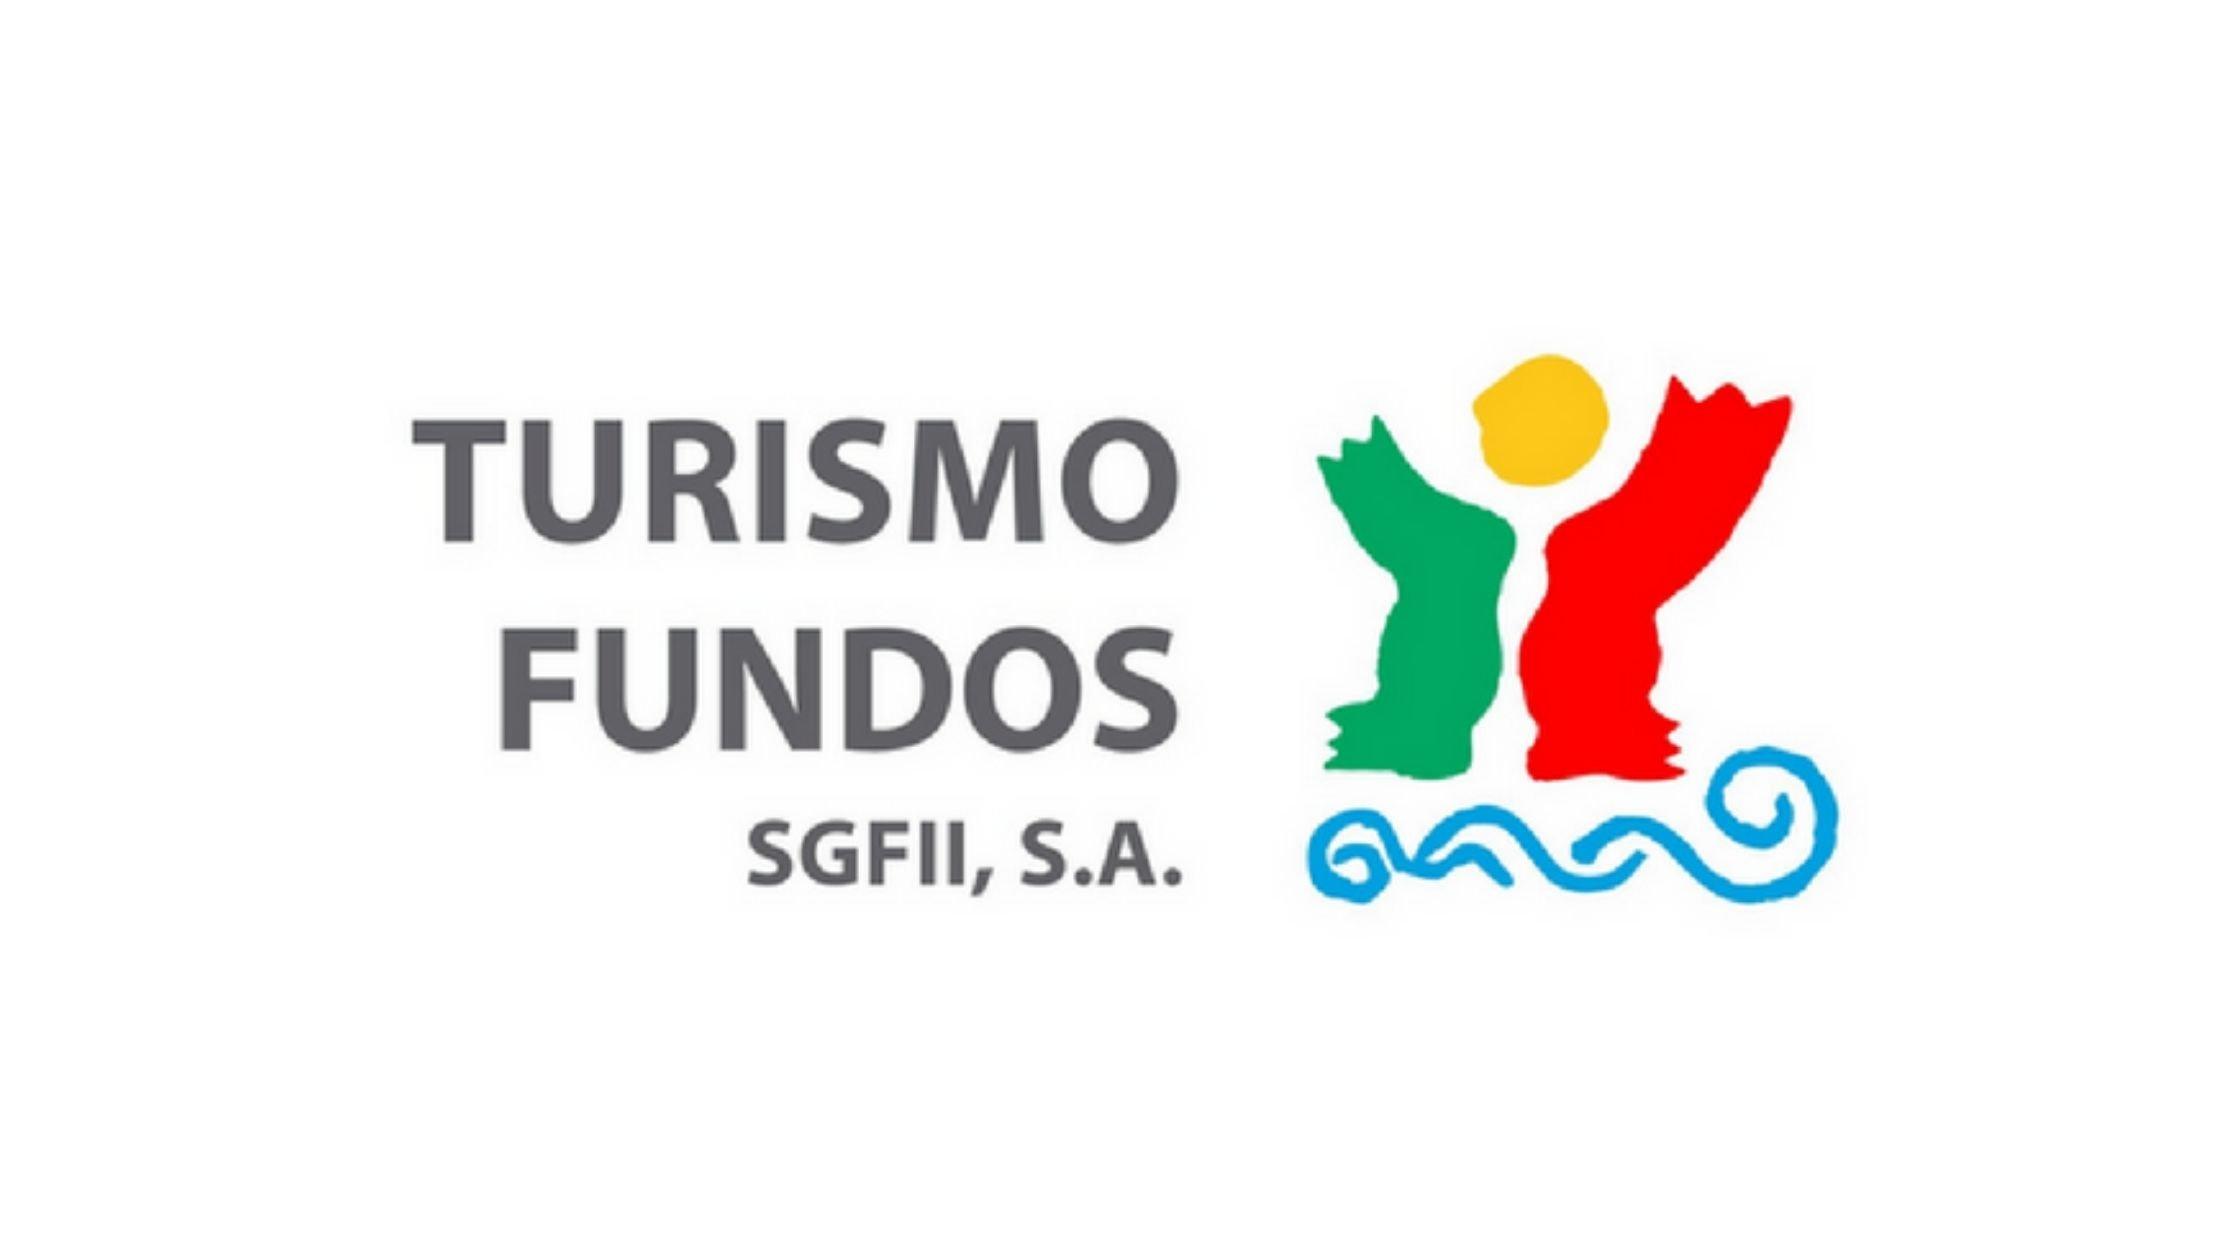 Investimento turismo fundos